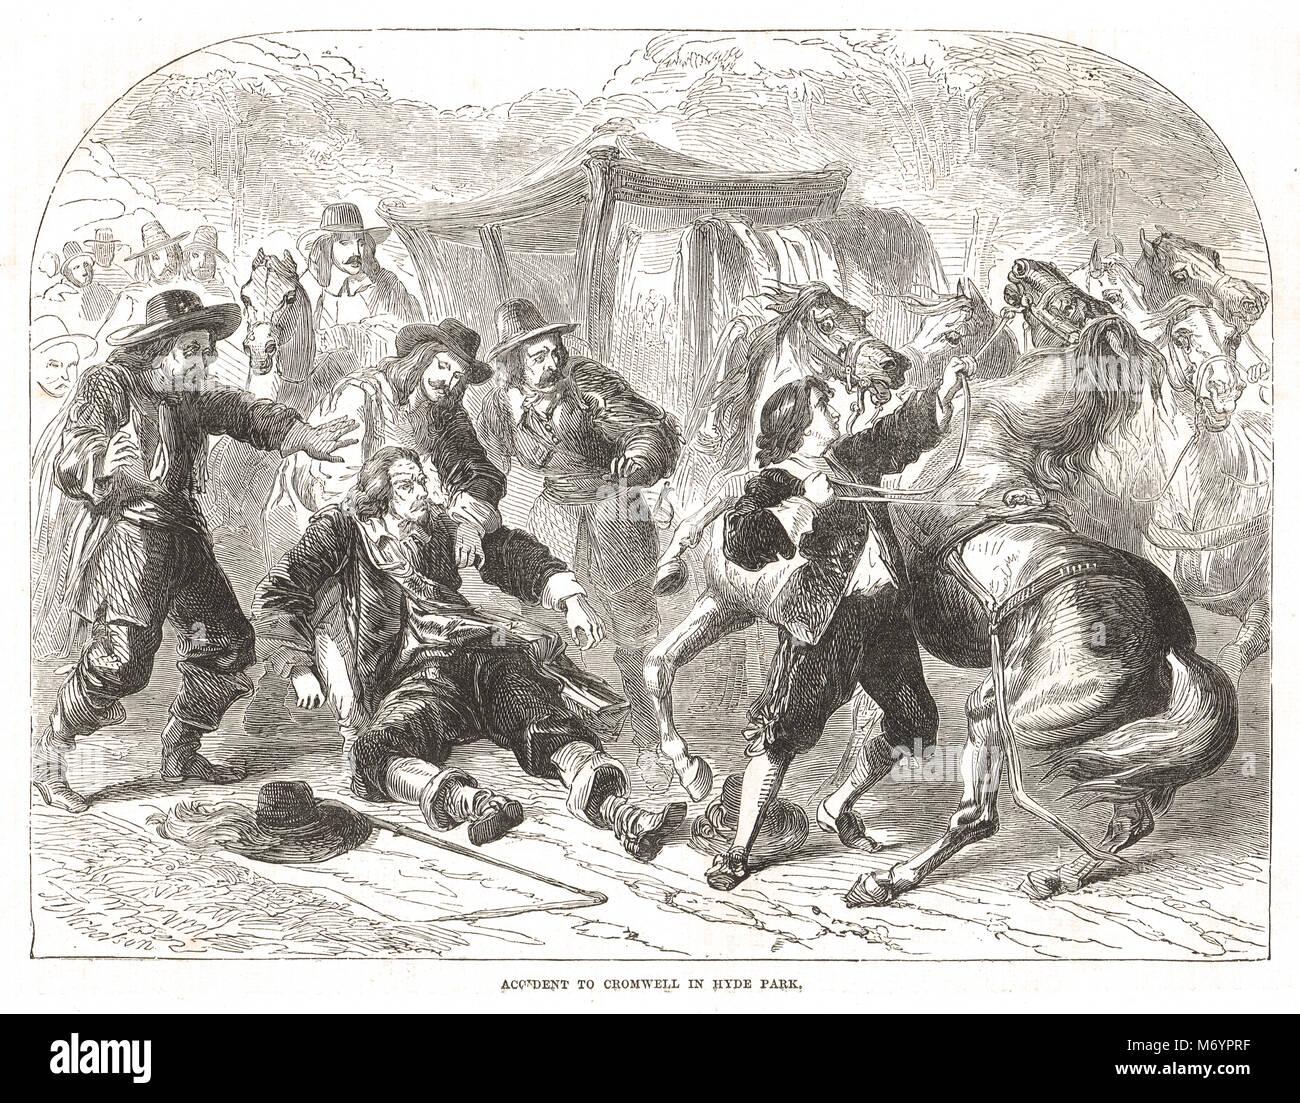 Oliver Cromwell el accidente a caballo en Hyde Park, Londres, Inglaterra, noviembre de 1654 Imagen De Stock